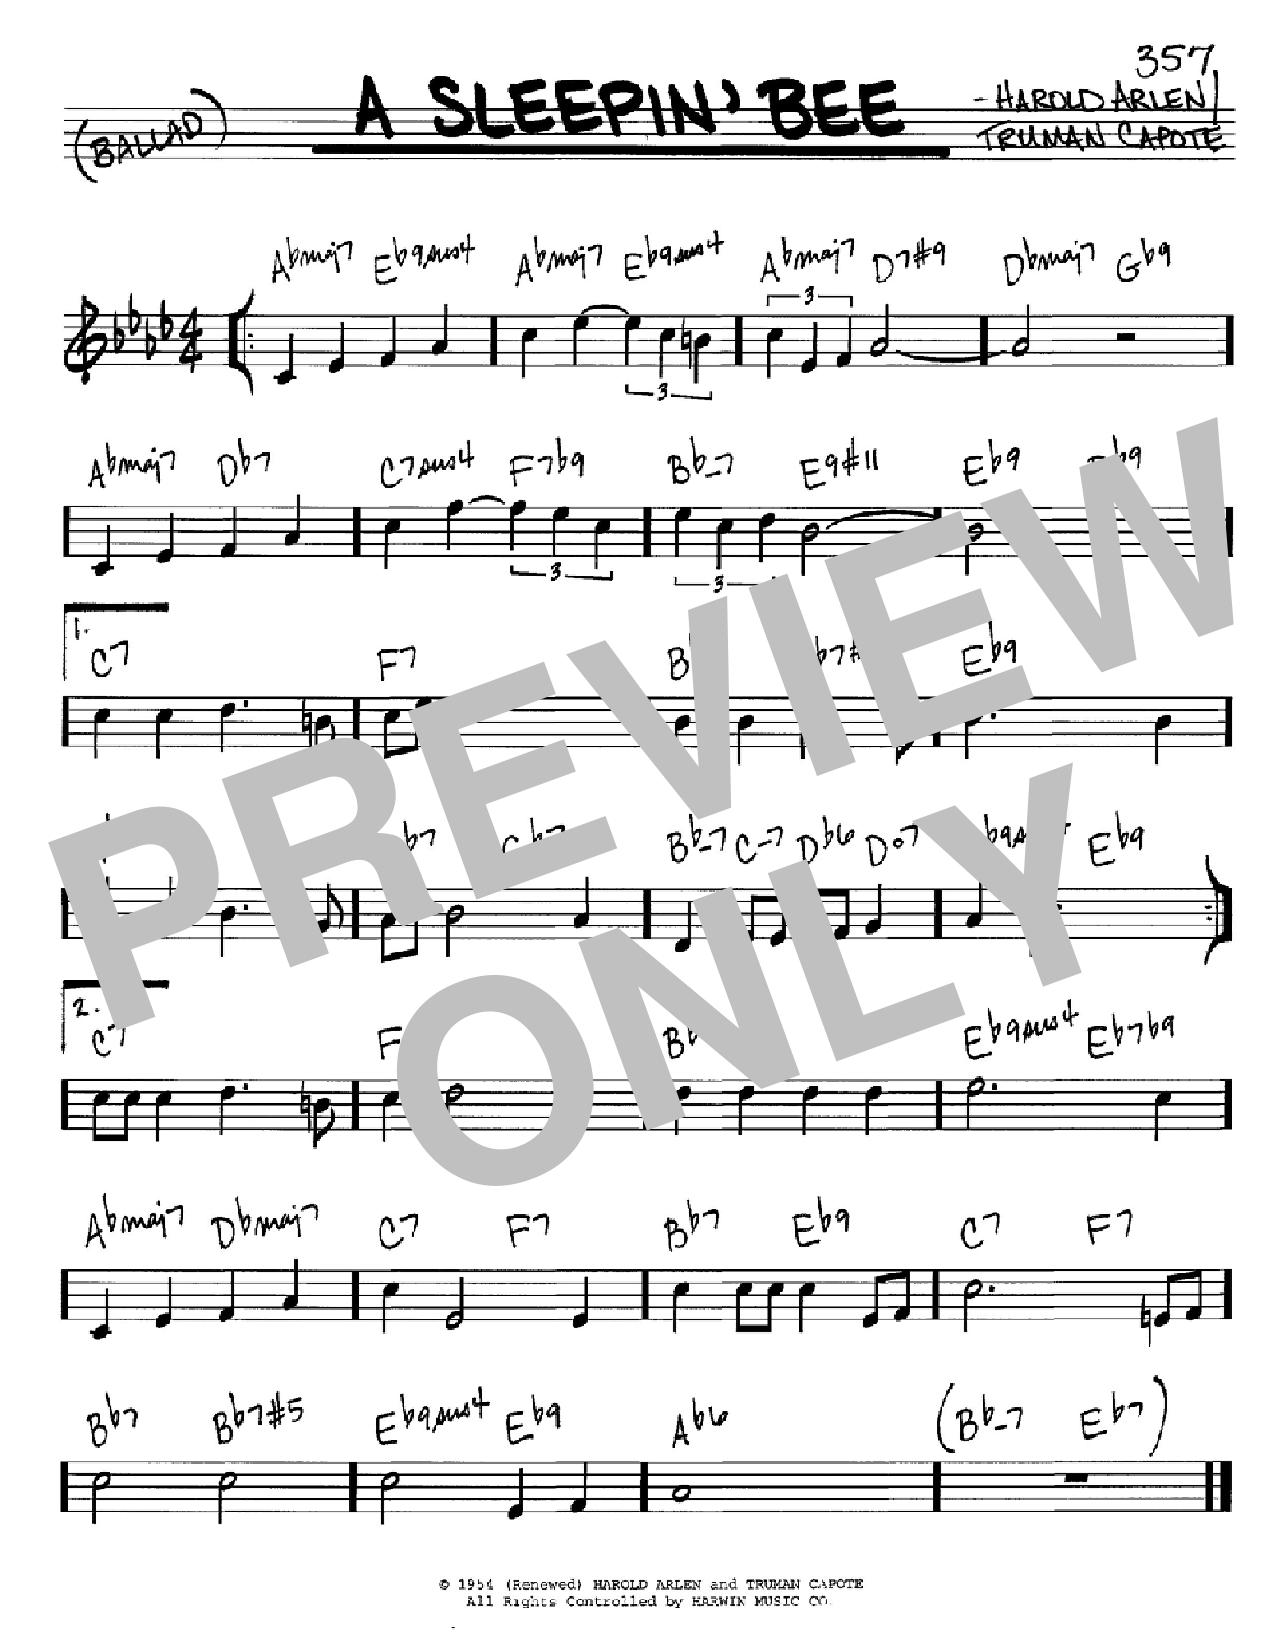 A Sleepin' Bee Sheet Music